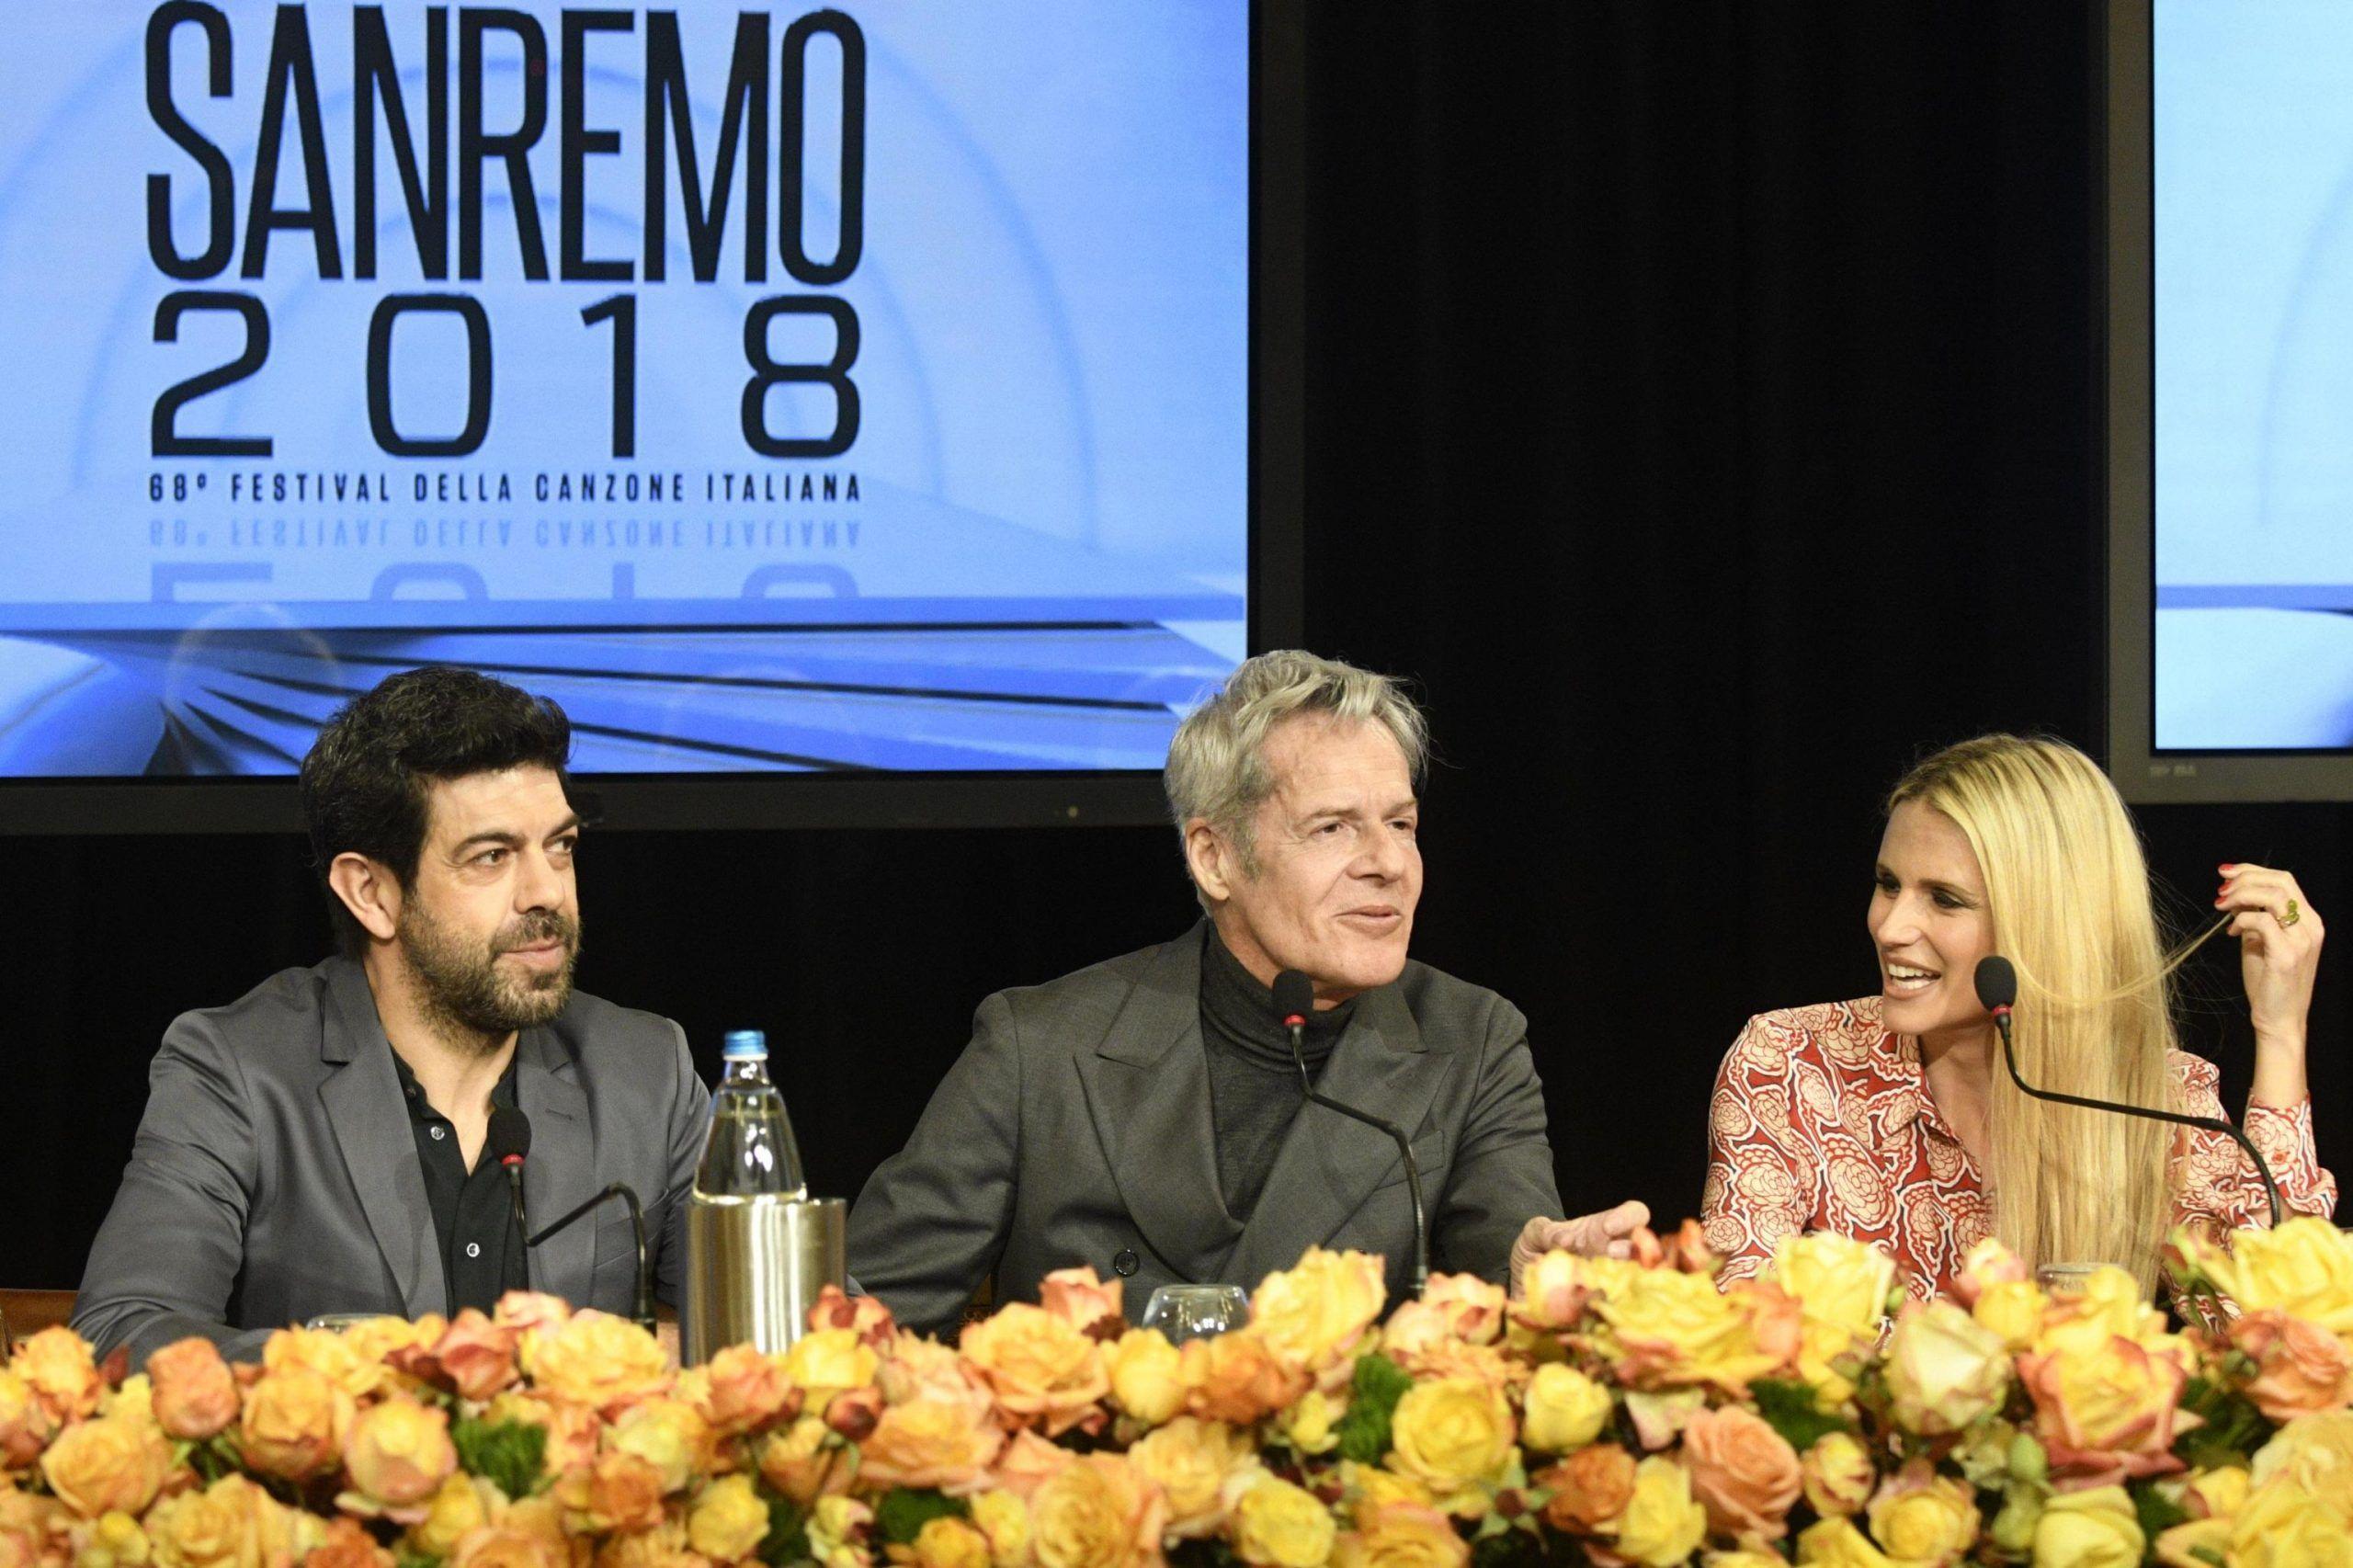 Sanremo Music Festival